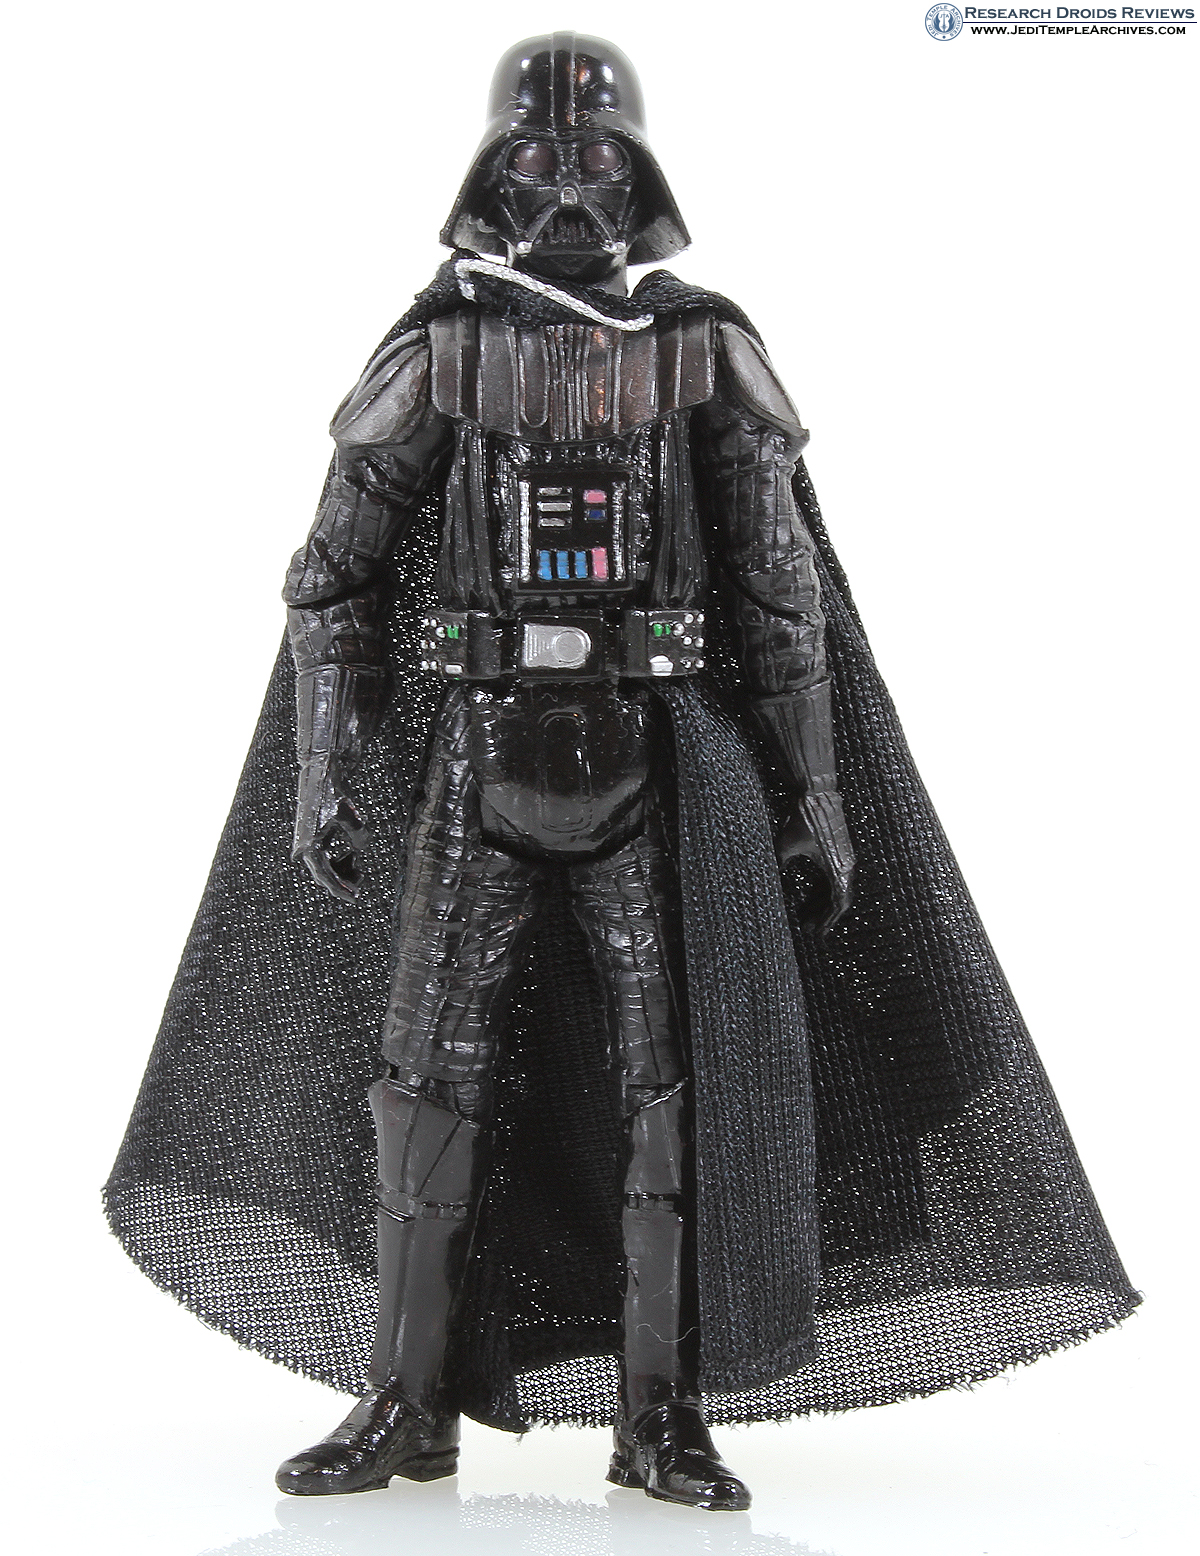 Darth Vader (Hoth)